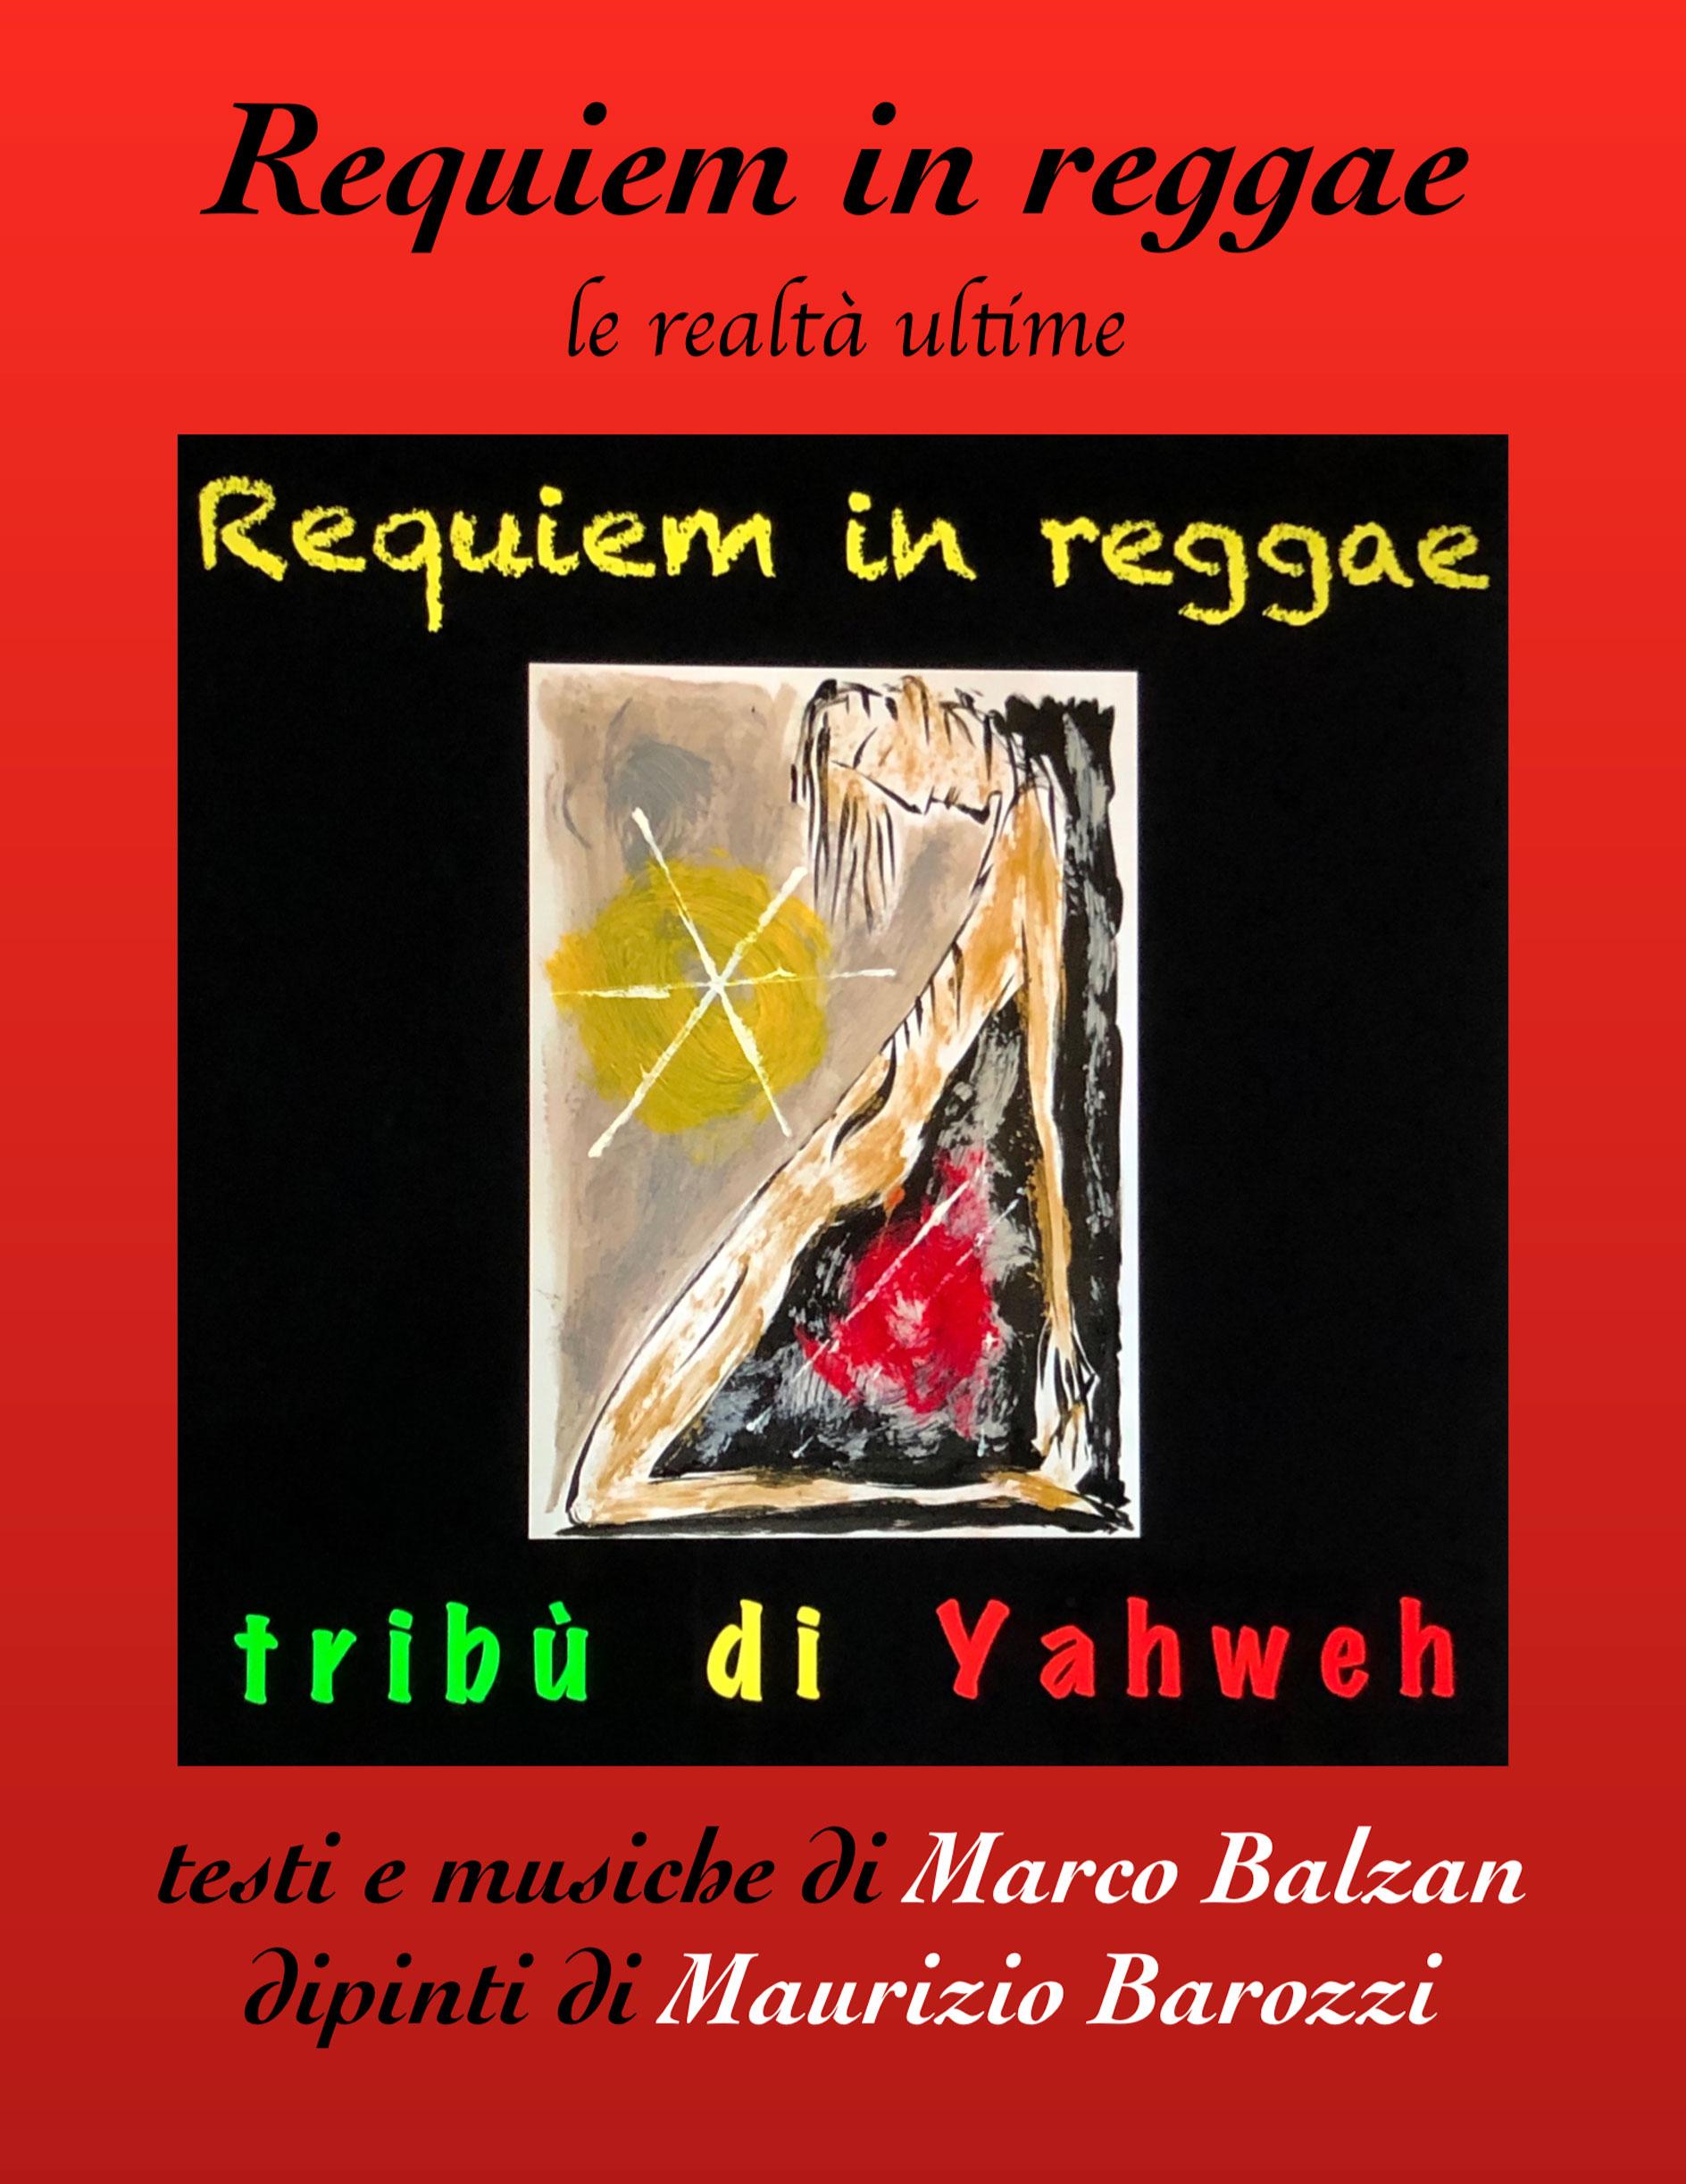 https://www.tribudiyahweh.com/wp/wp-content/uploads/2019/03/requiem-in-reggae.jpg